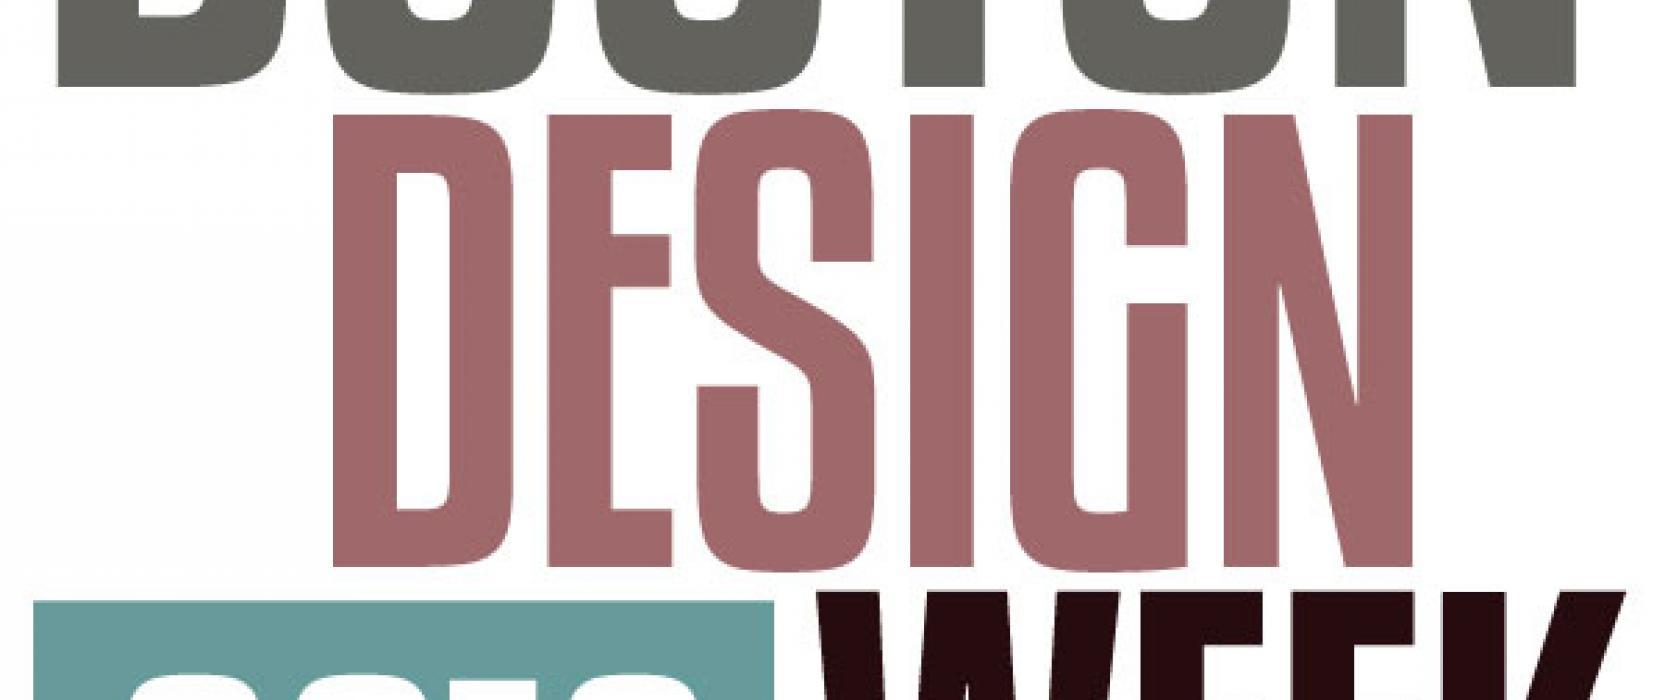 Third Annual Boston Design Week: March 30 – April 10, 2016